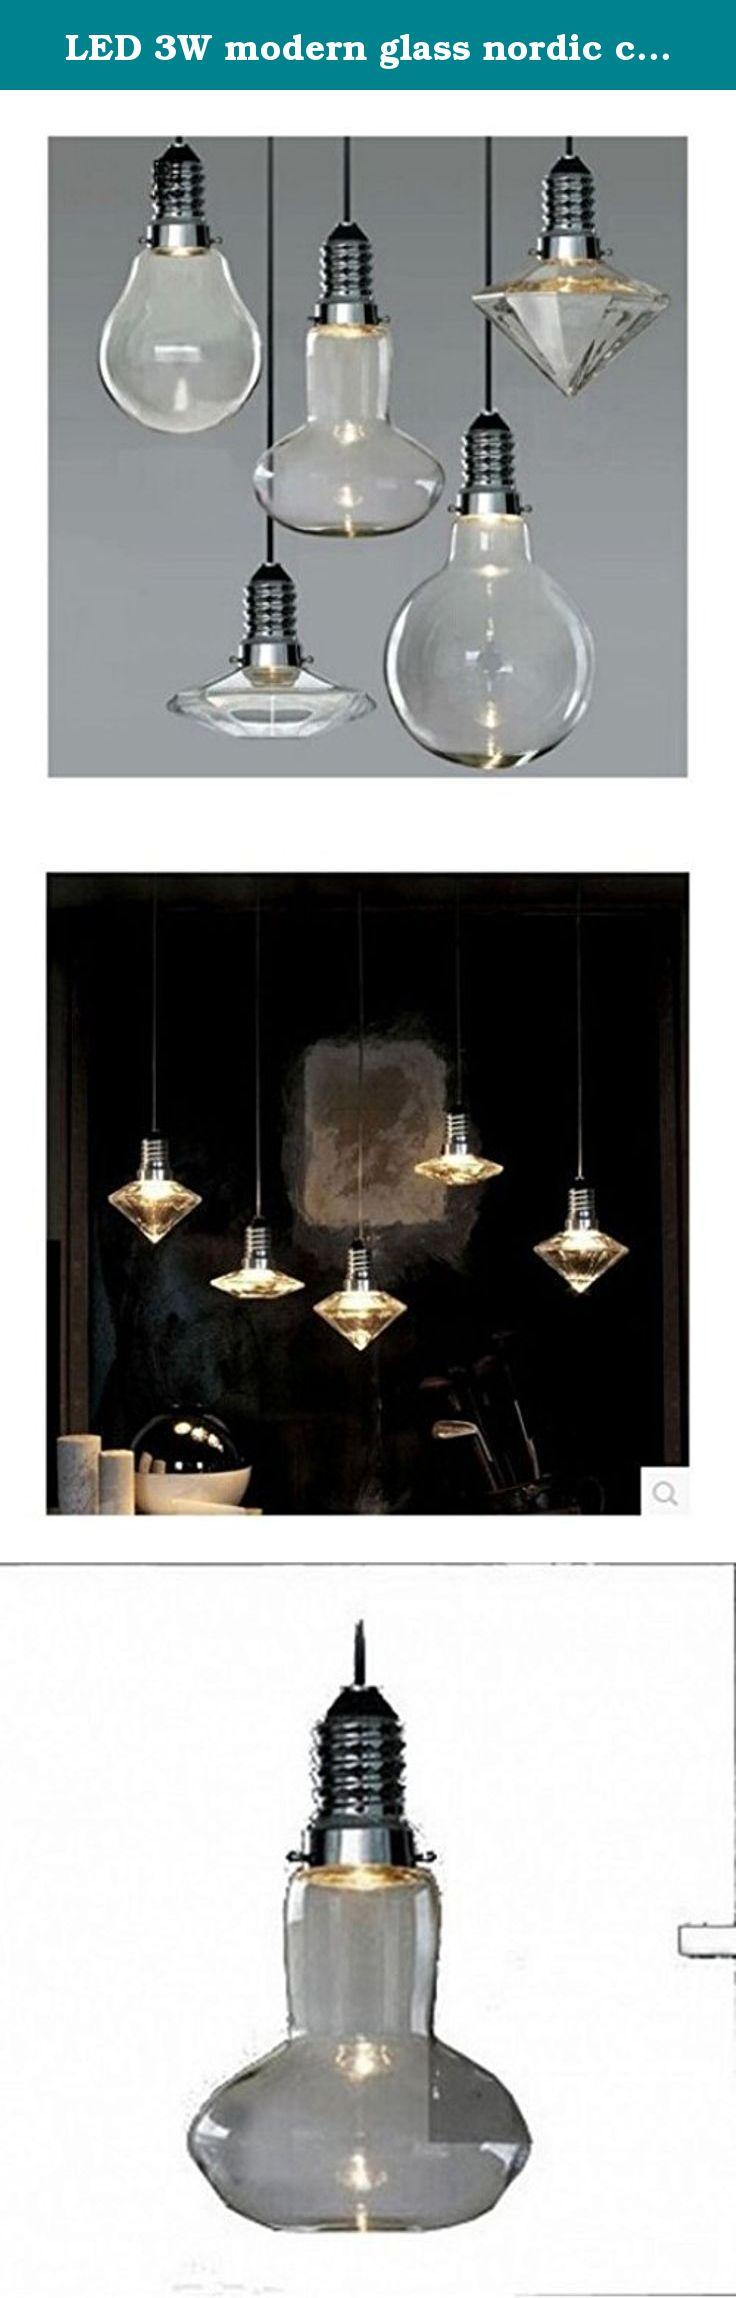 LED 3W modern glass nordic creative bar counter pendant lamp light.  Material:Glass Size